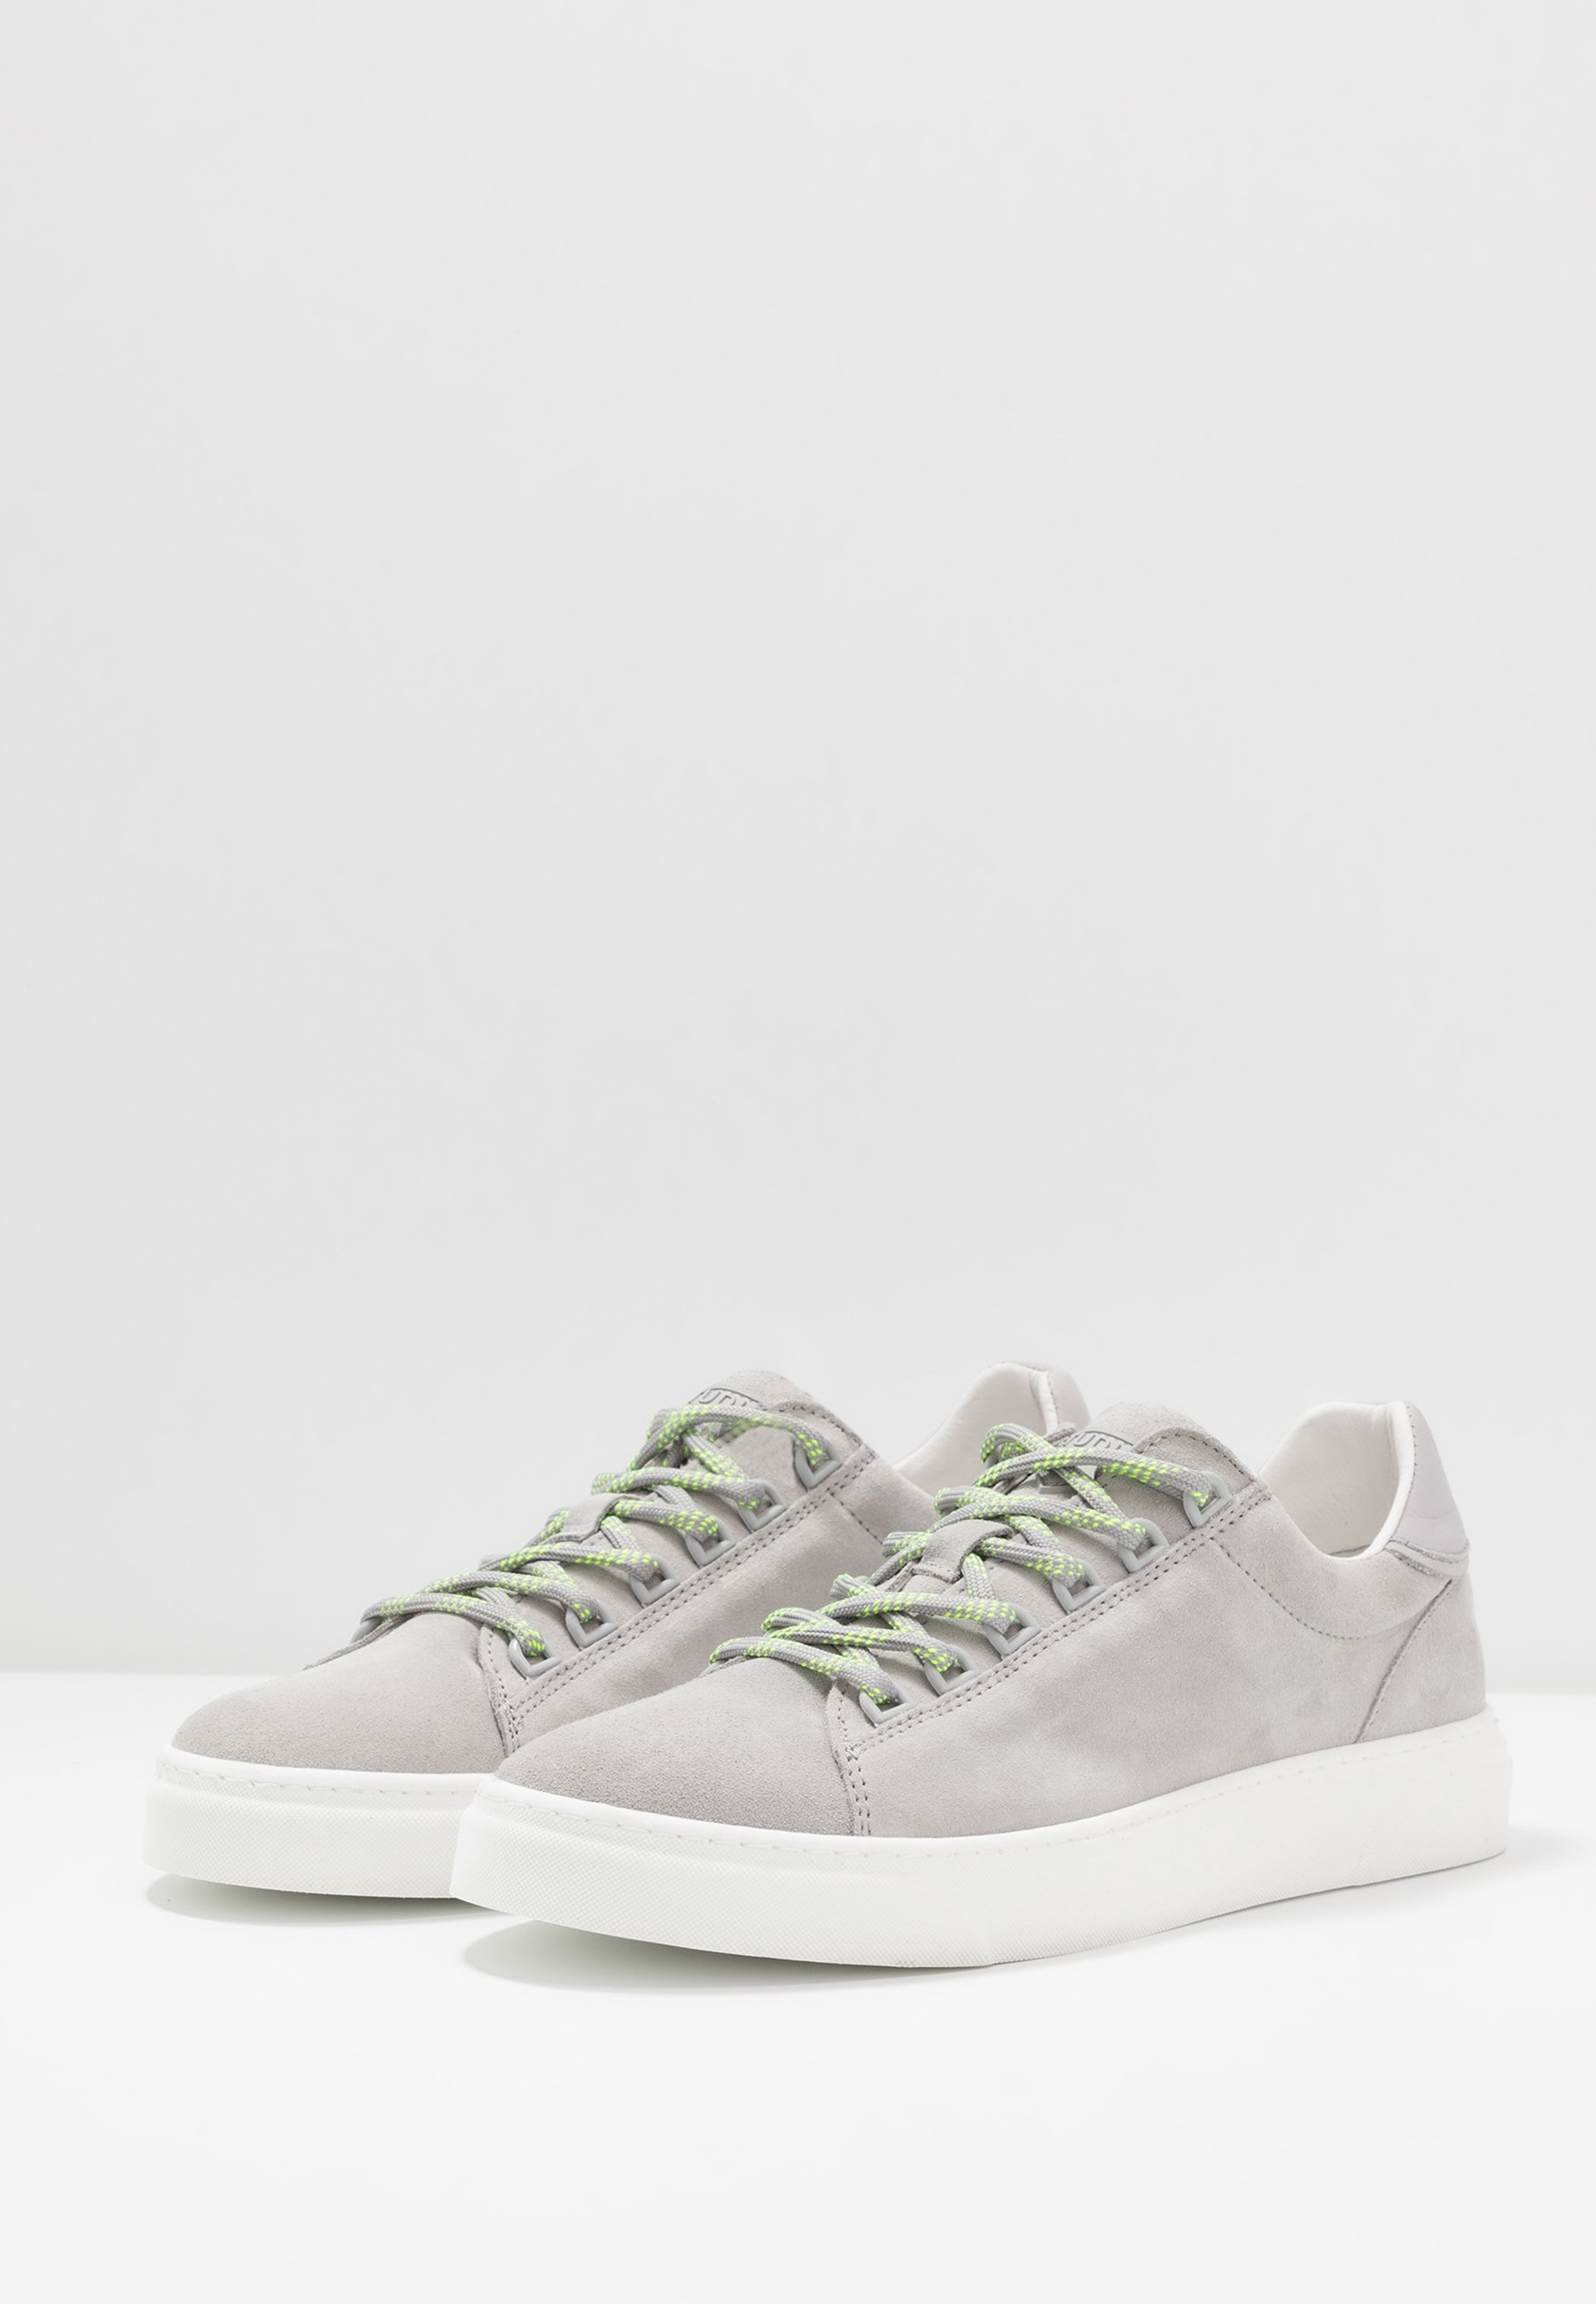 LAST STUDIO CHARLES - Sneaker low - grey/grau - Herrenschuhe WlFBq